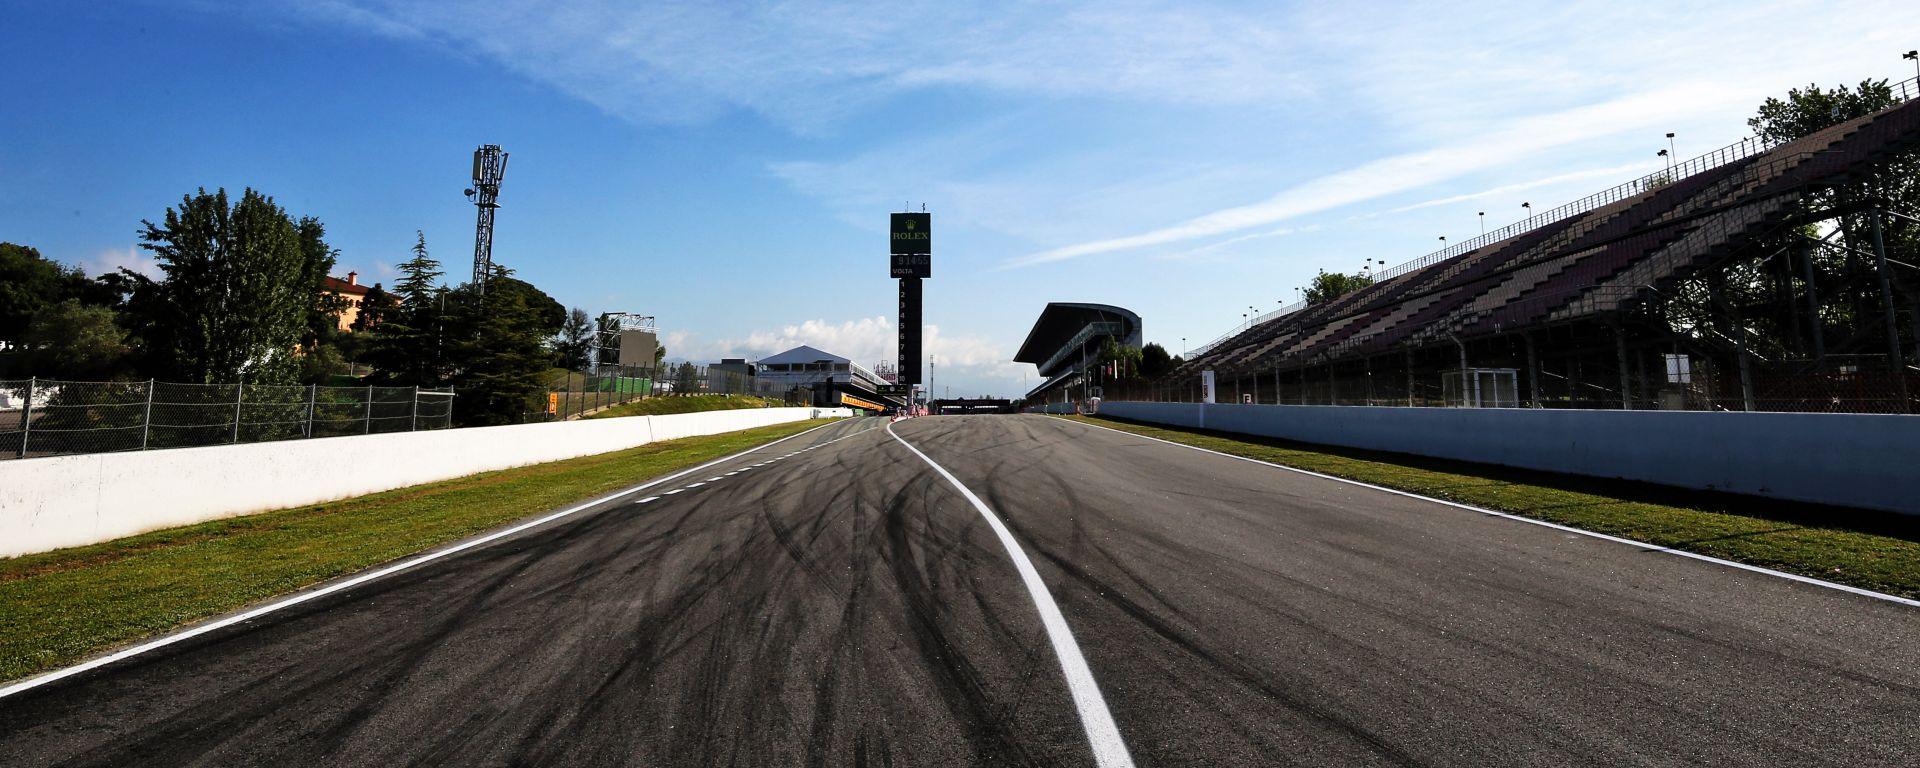 F1: il Circuit de Catalunya di Barcellona, sede del GP Spagna